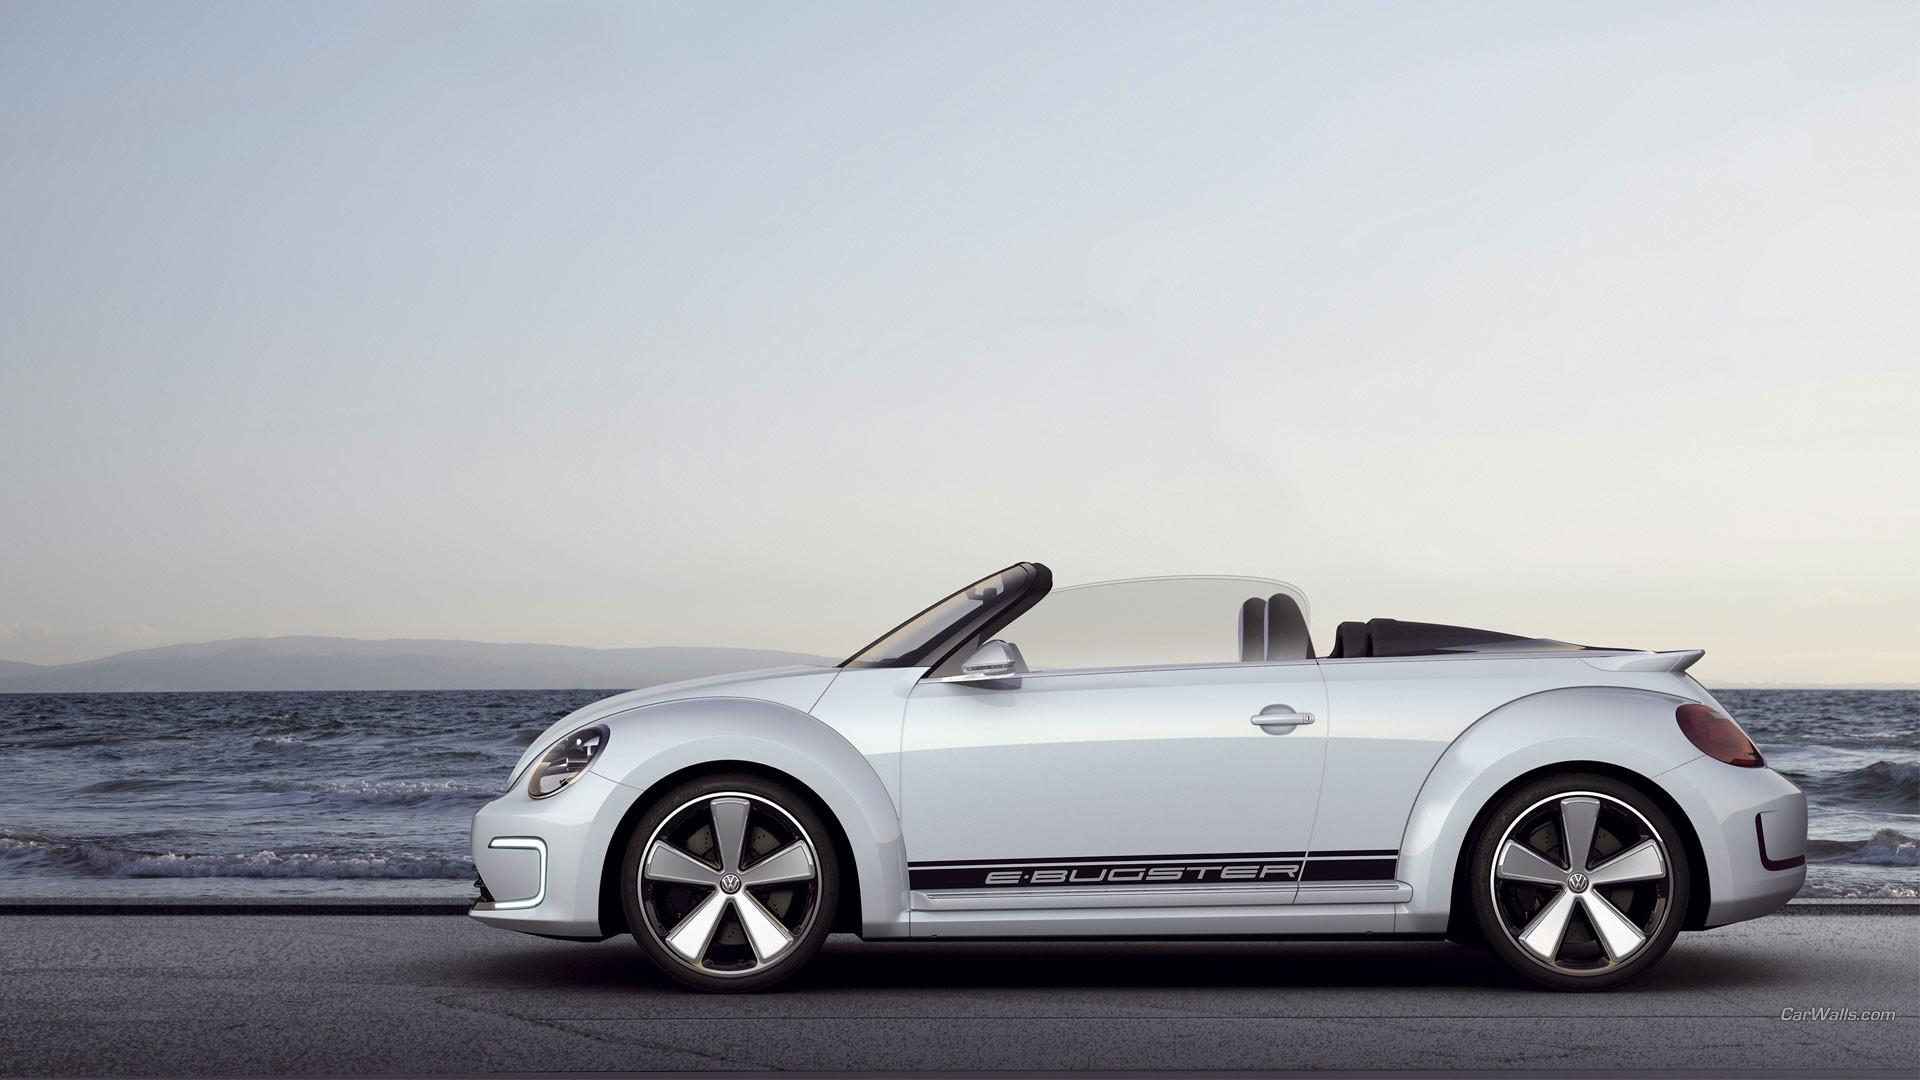 Car Vehicle Volkswagen Volkswagen Beetle Sports Car Convertible VW E  Bugster Wheel Land Vehicle Automotive Design